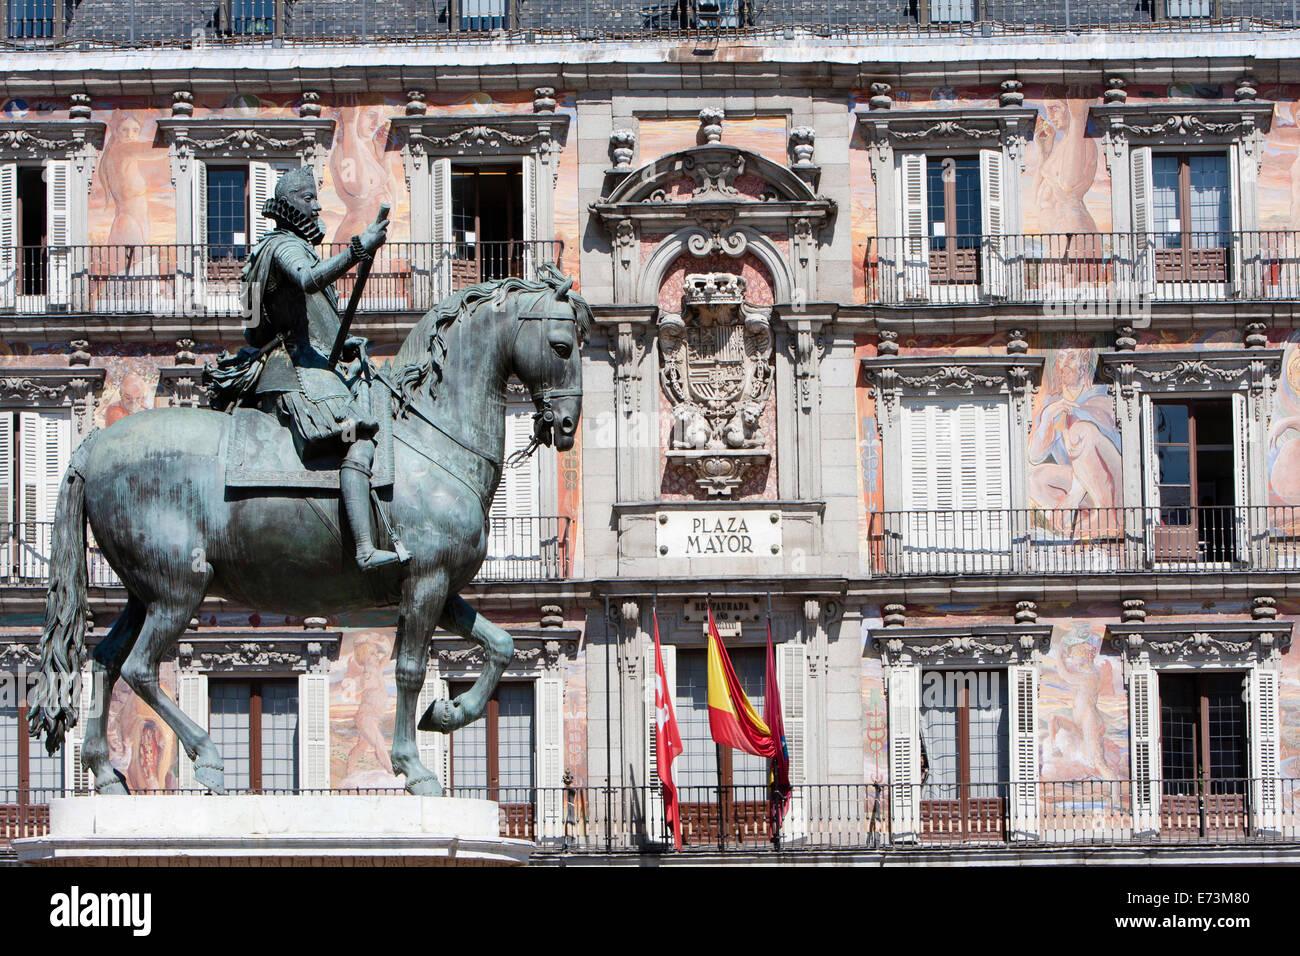 Spain, Madrid, Statue of King Philip III in the Plaza Mayor. Stock Photo